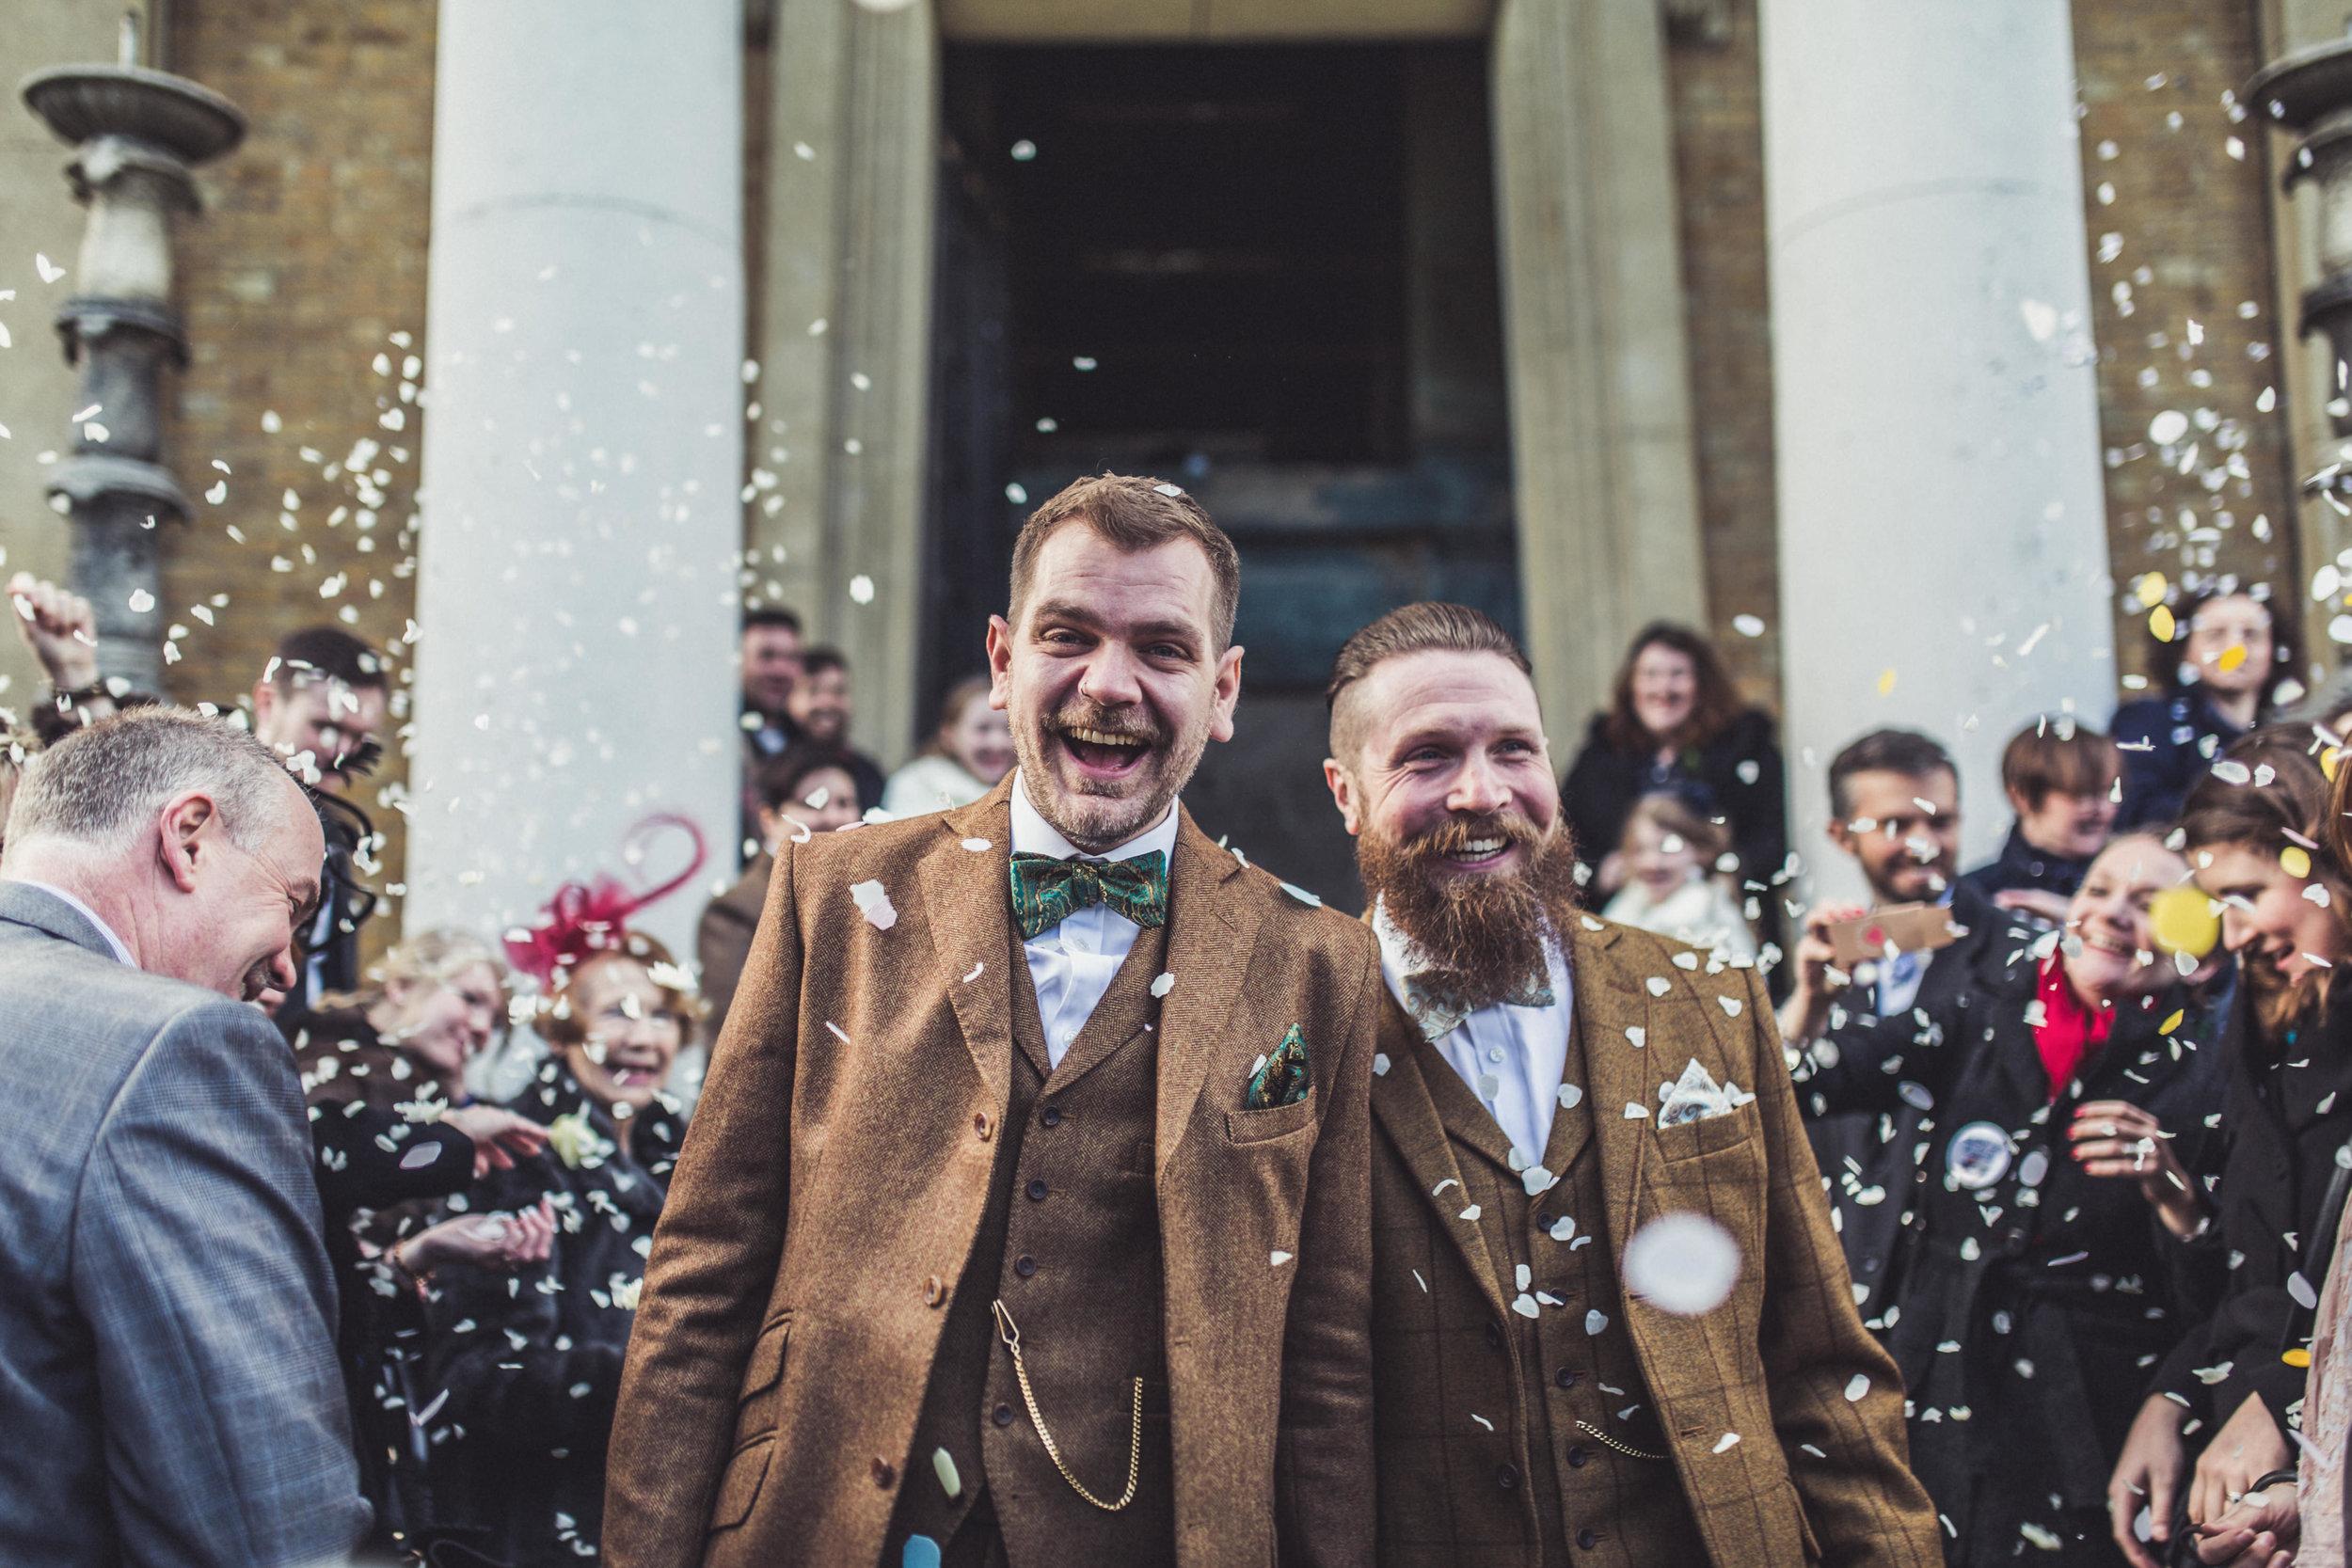 Anthony&NIcholaswedding-241.jpg